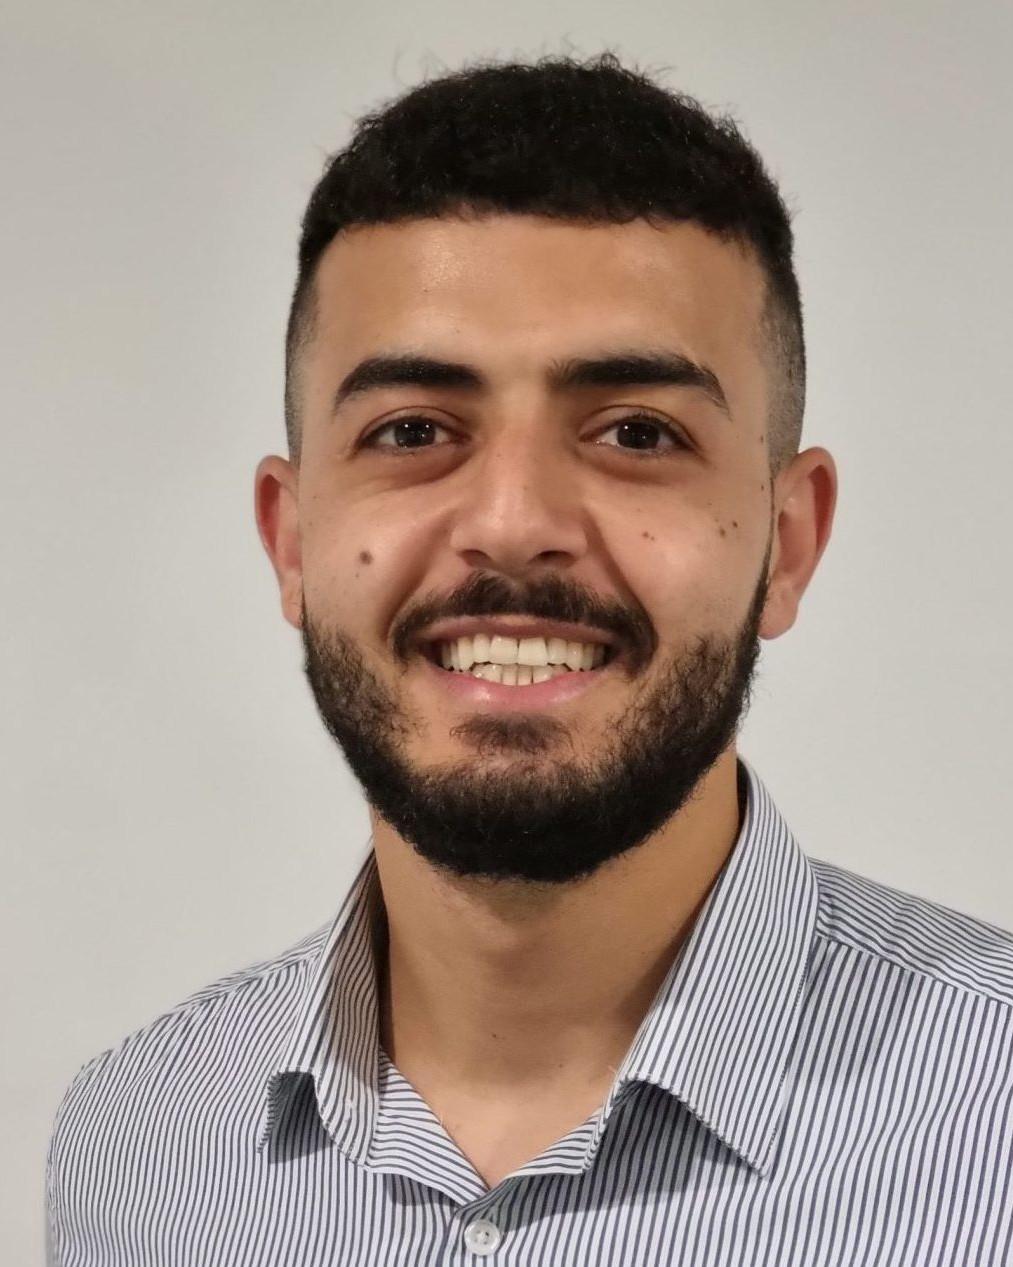 Mohamad El Hassan Podiatrist at Peninsula Foot Clinic Somervile and Rosebud